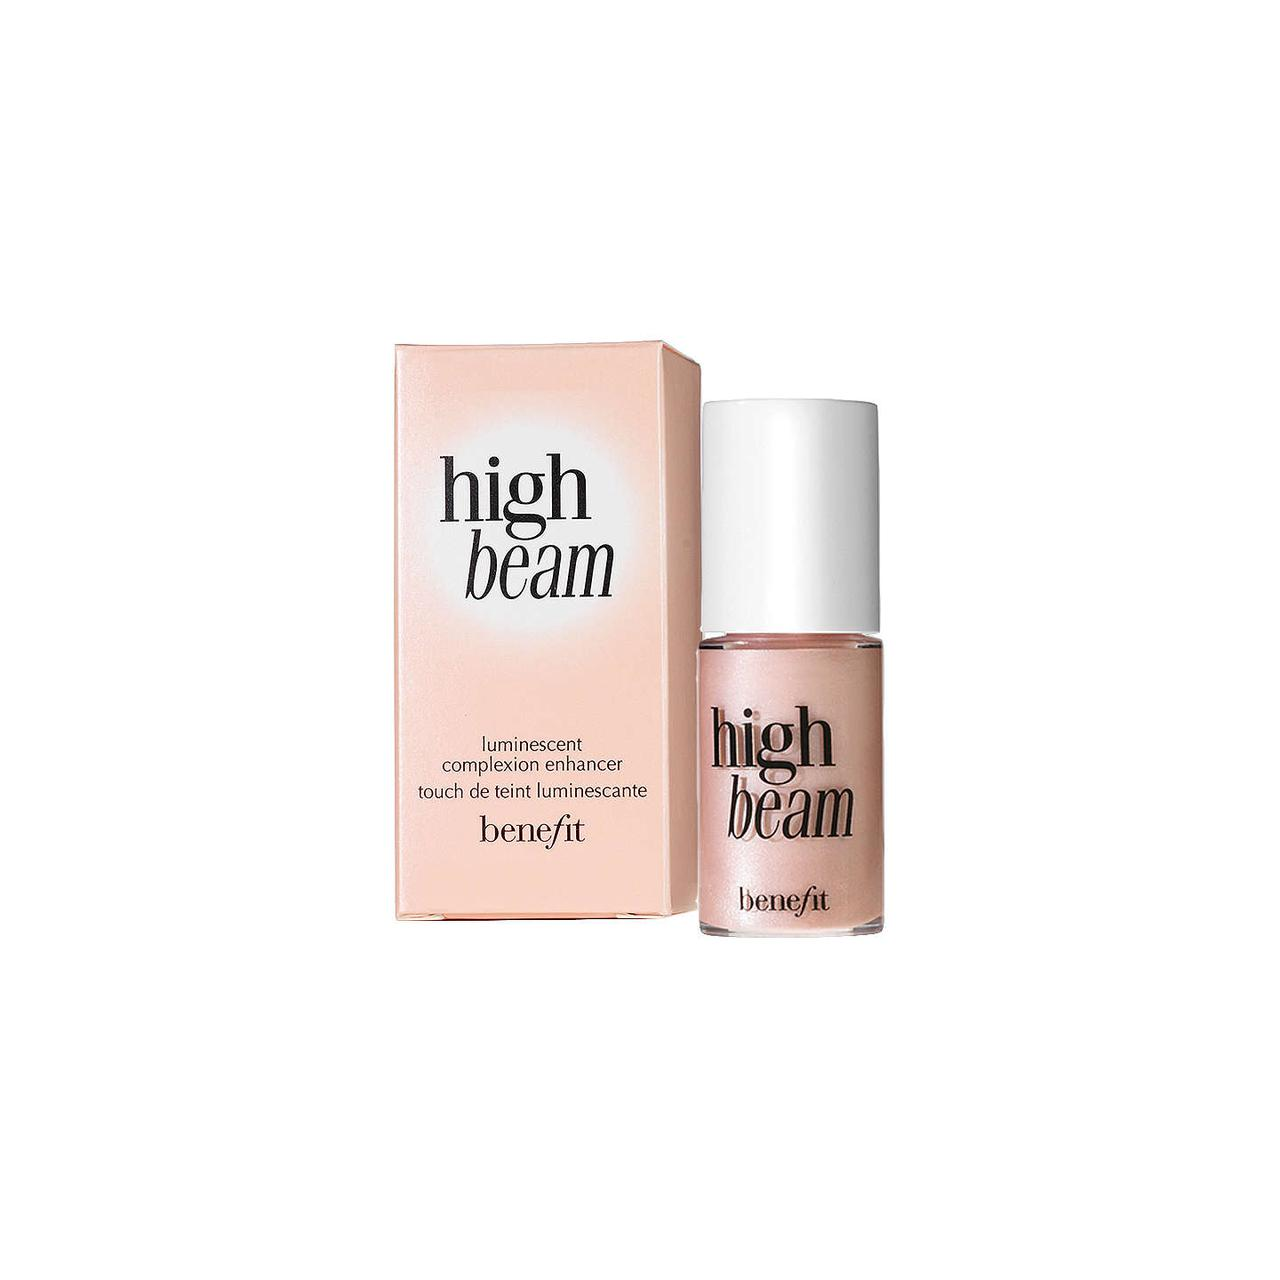 Хайлайтер для лица Benefit High Beam mini